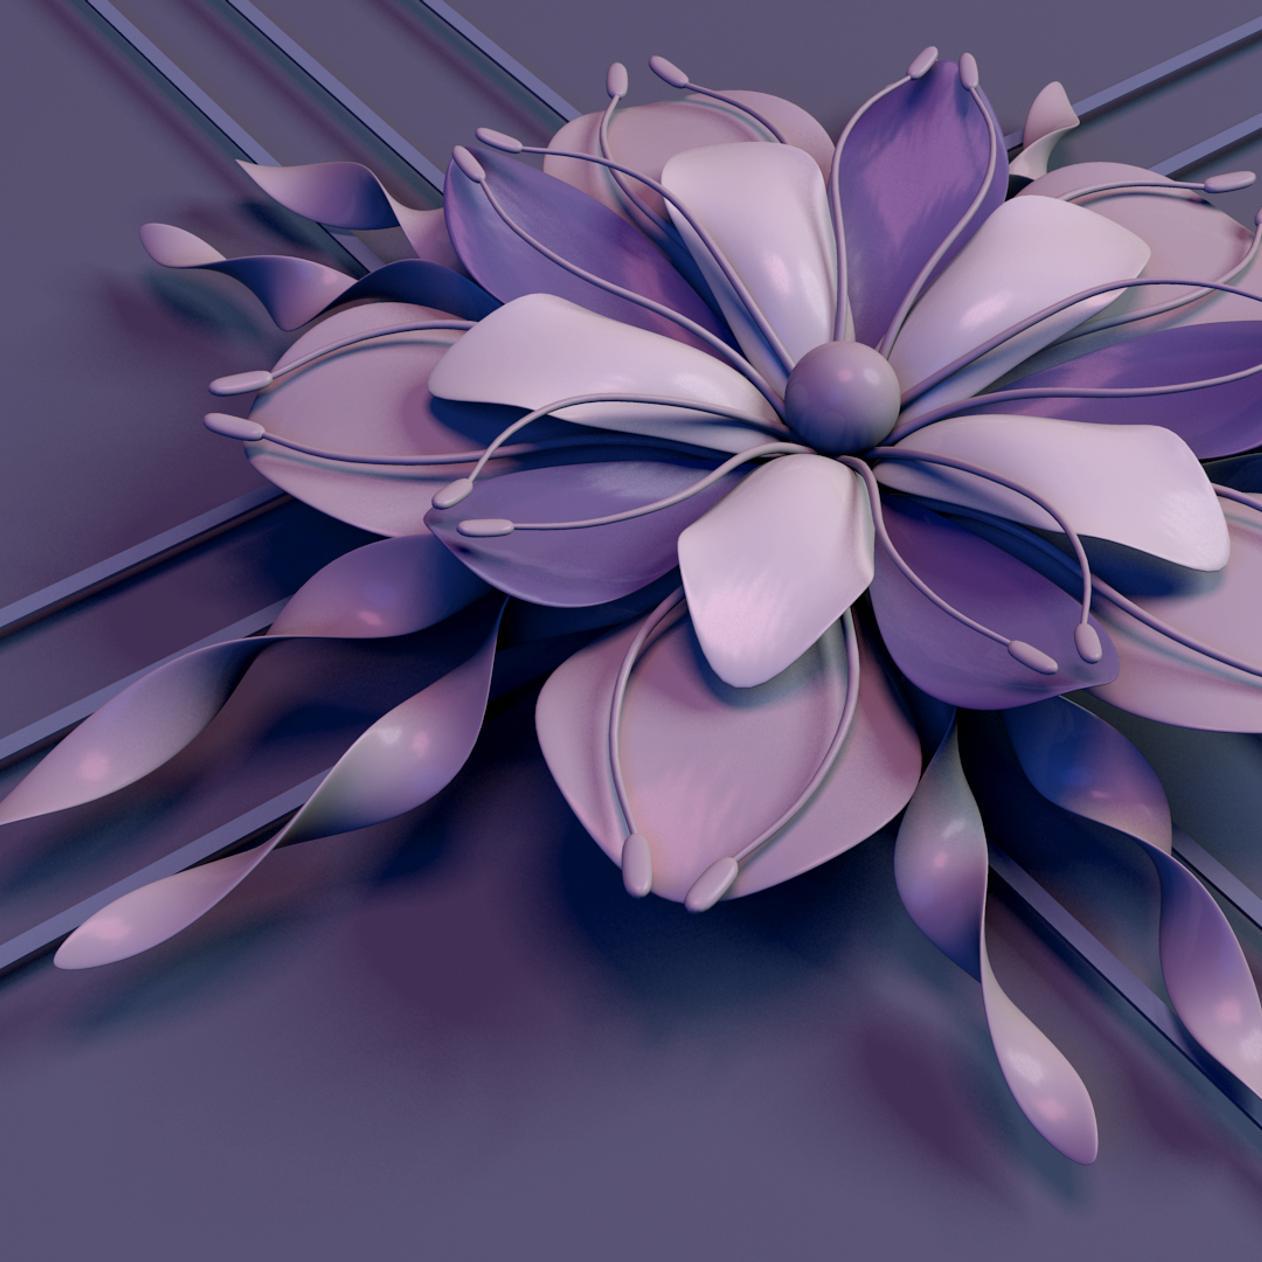 Download Wallpaper 1262x1262 Abstract flower - Beautiful purple 3D flower